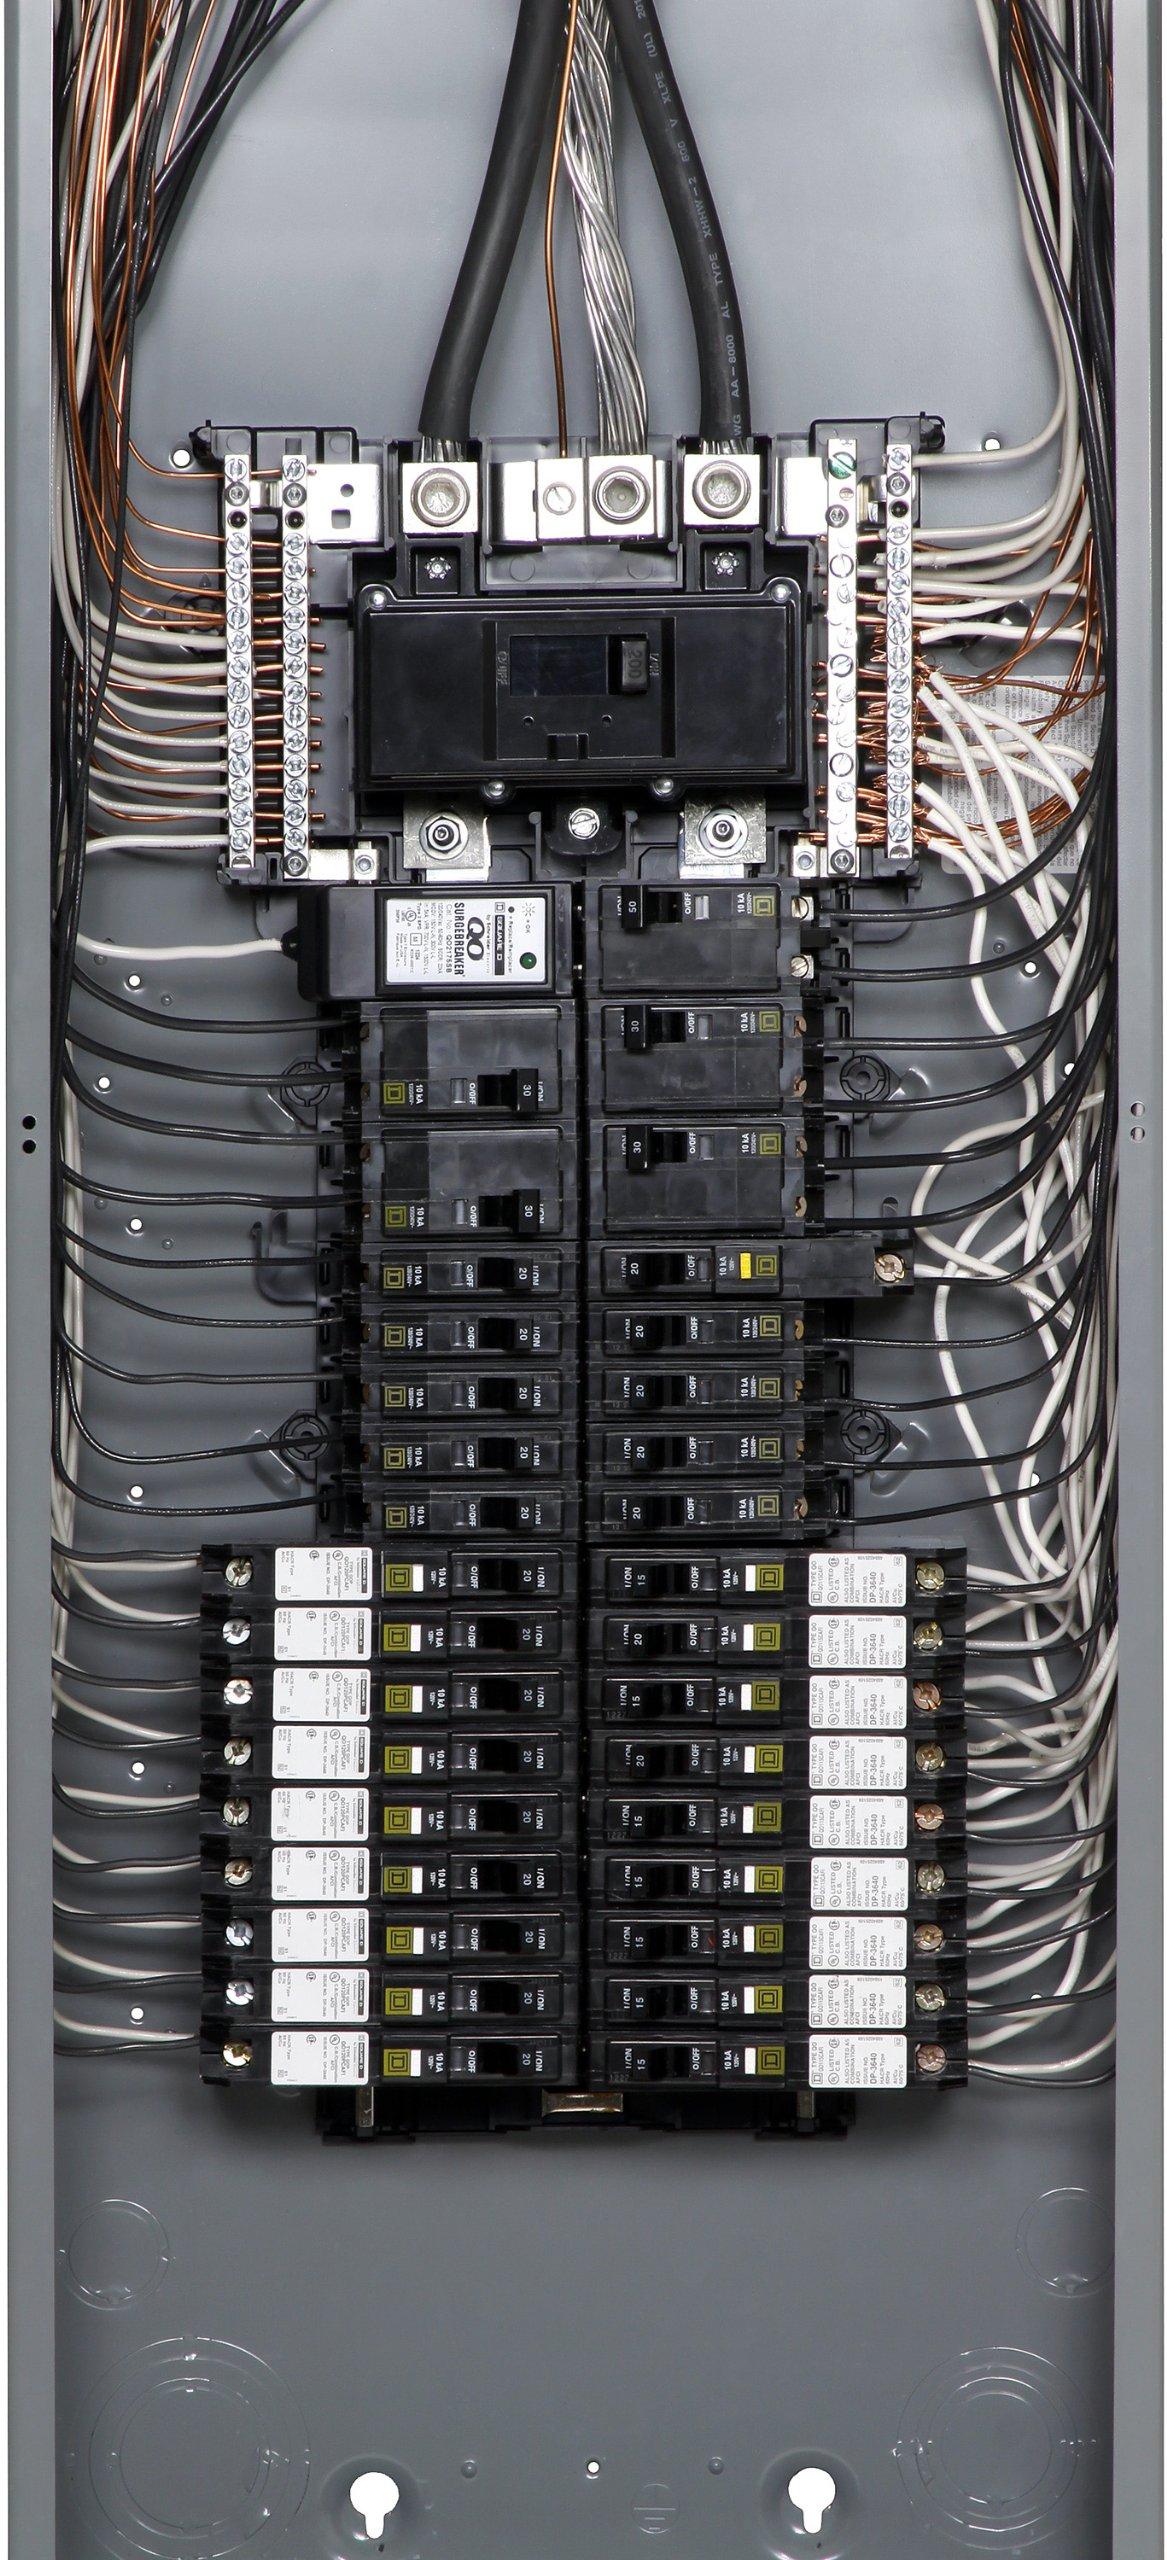 qo load center wiring diagram 30 amp twist lock plug breaker get free image about